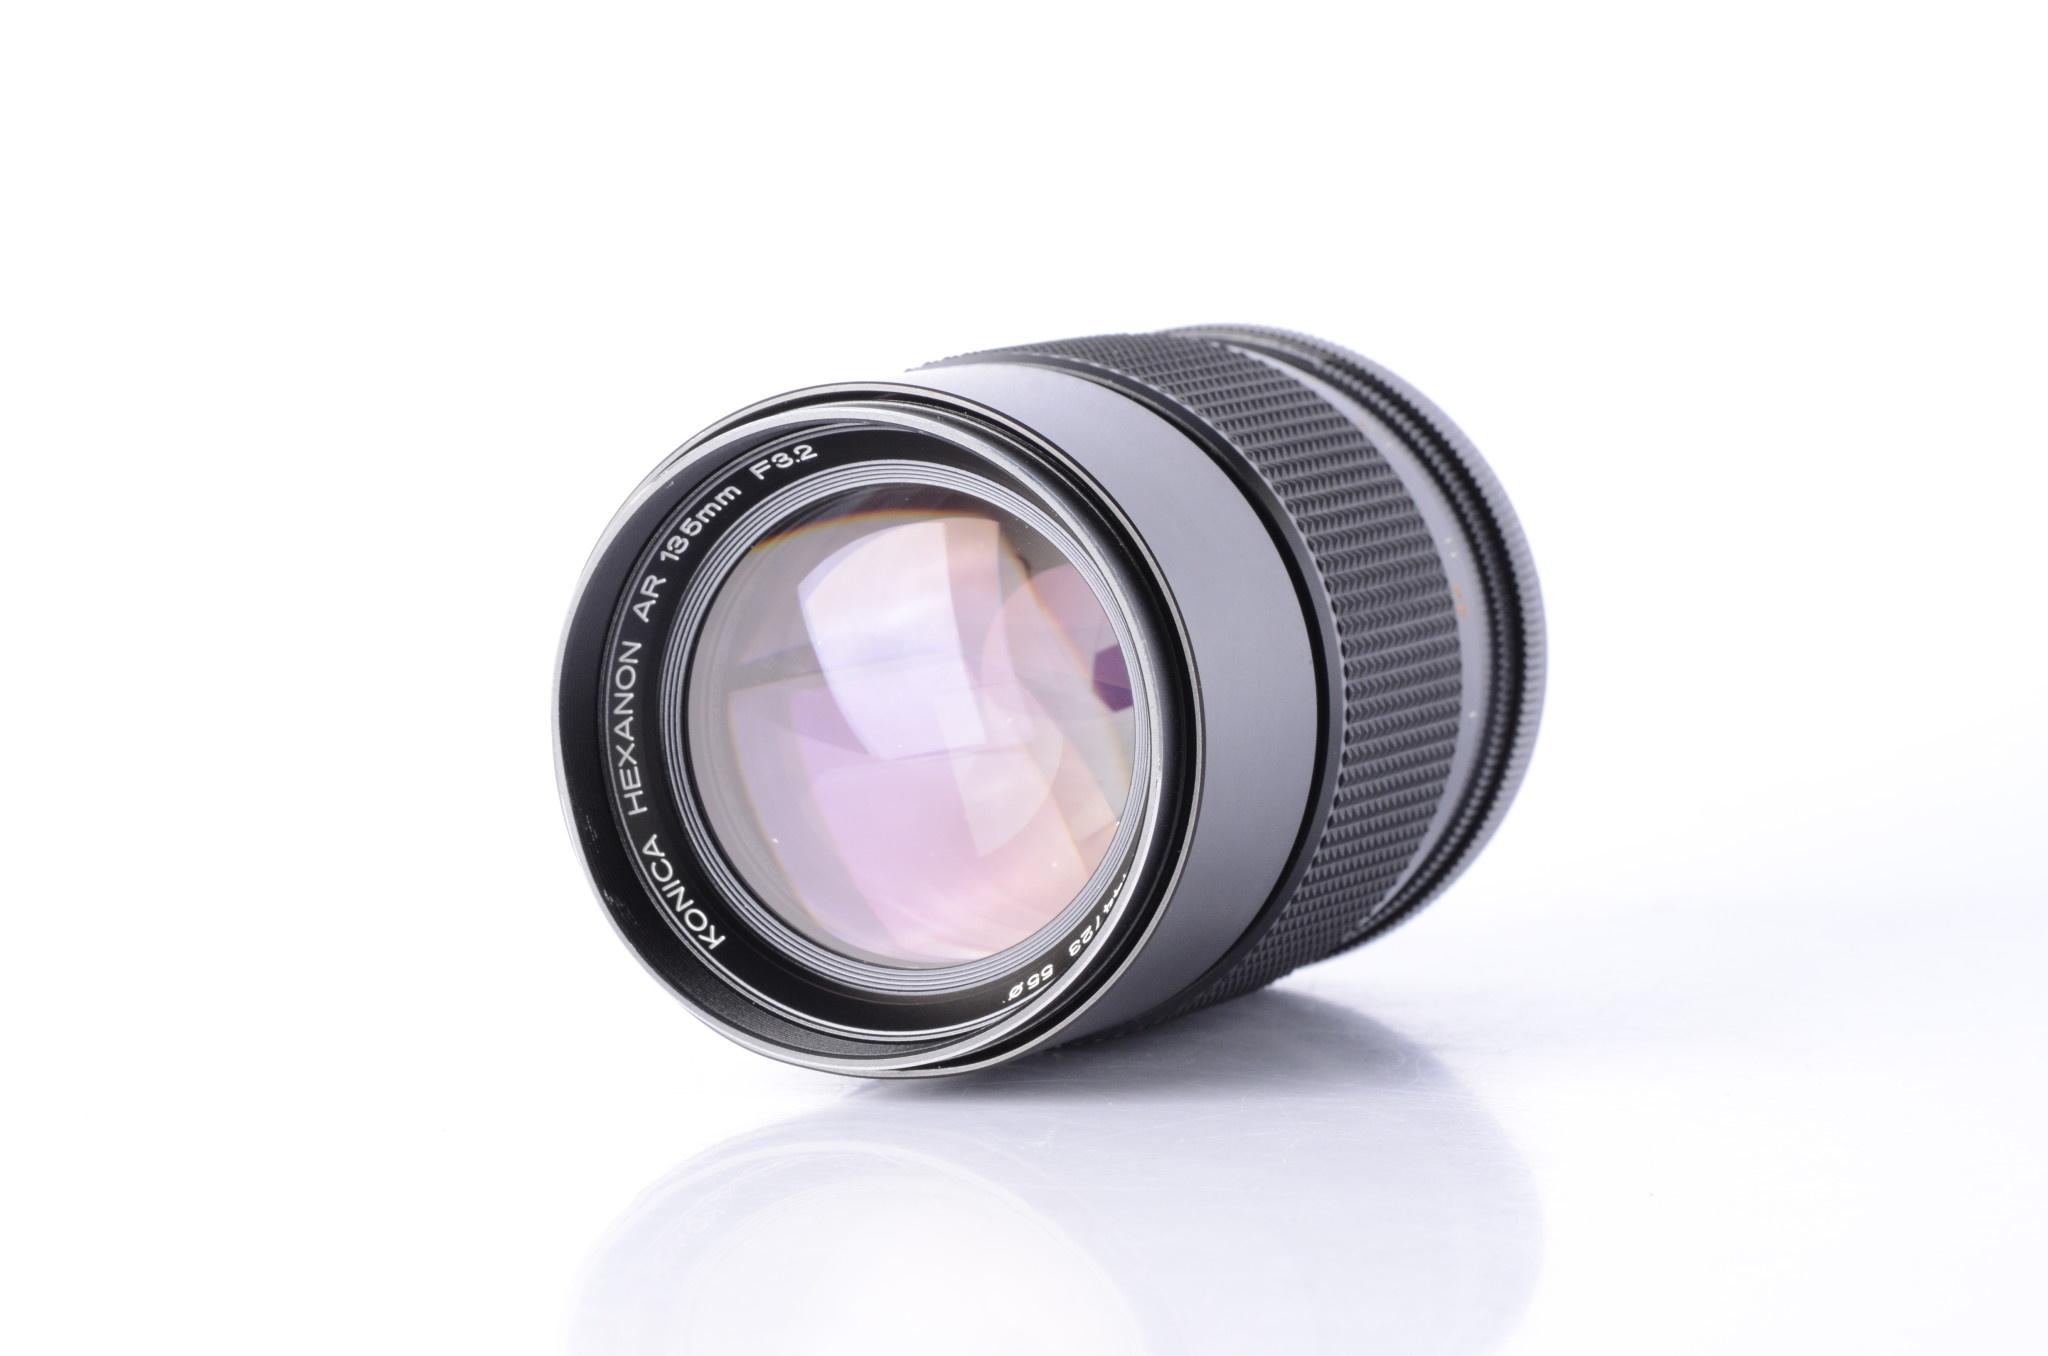 Konica Konica Hexanon AR 135mm F/3.2 Portrait lens